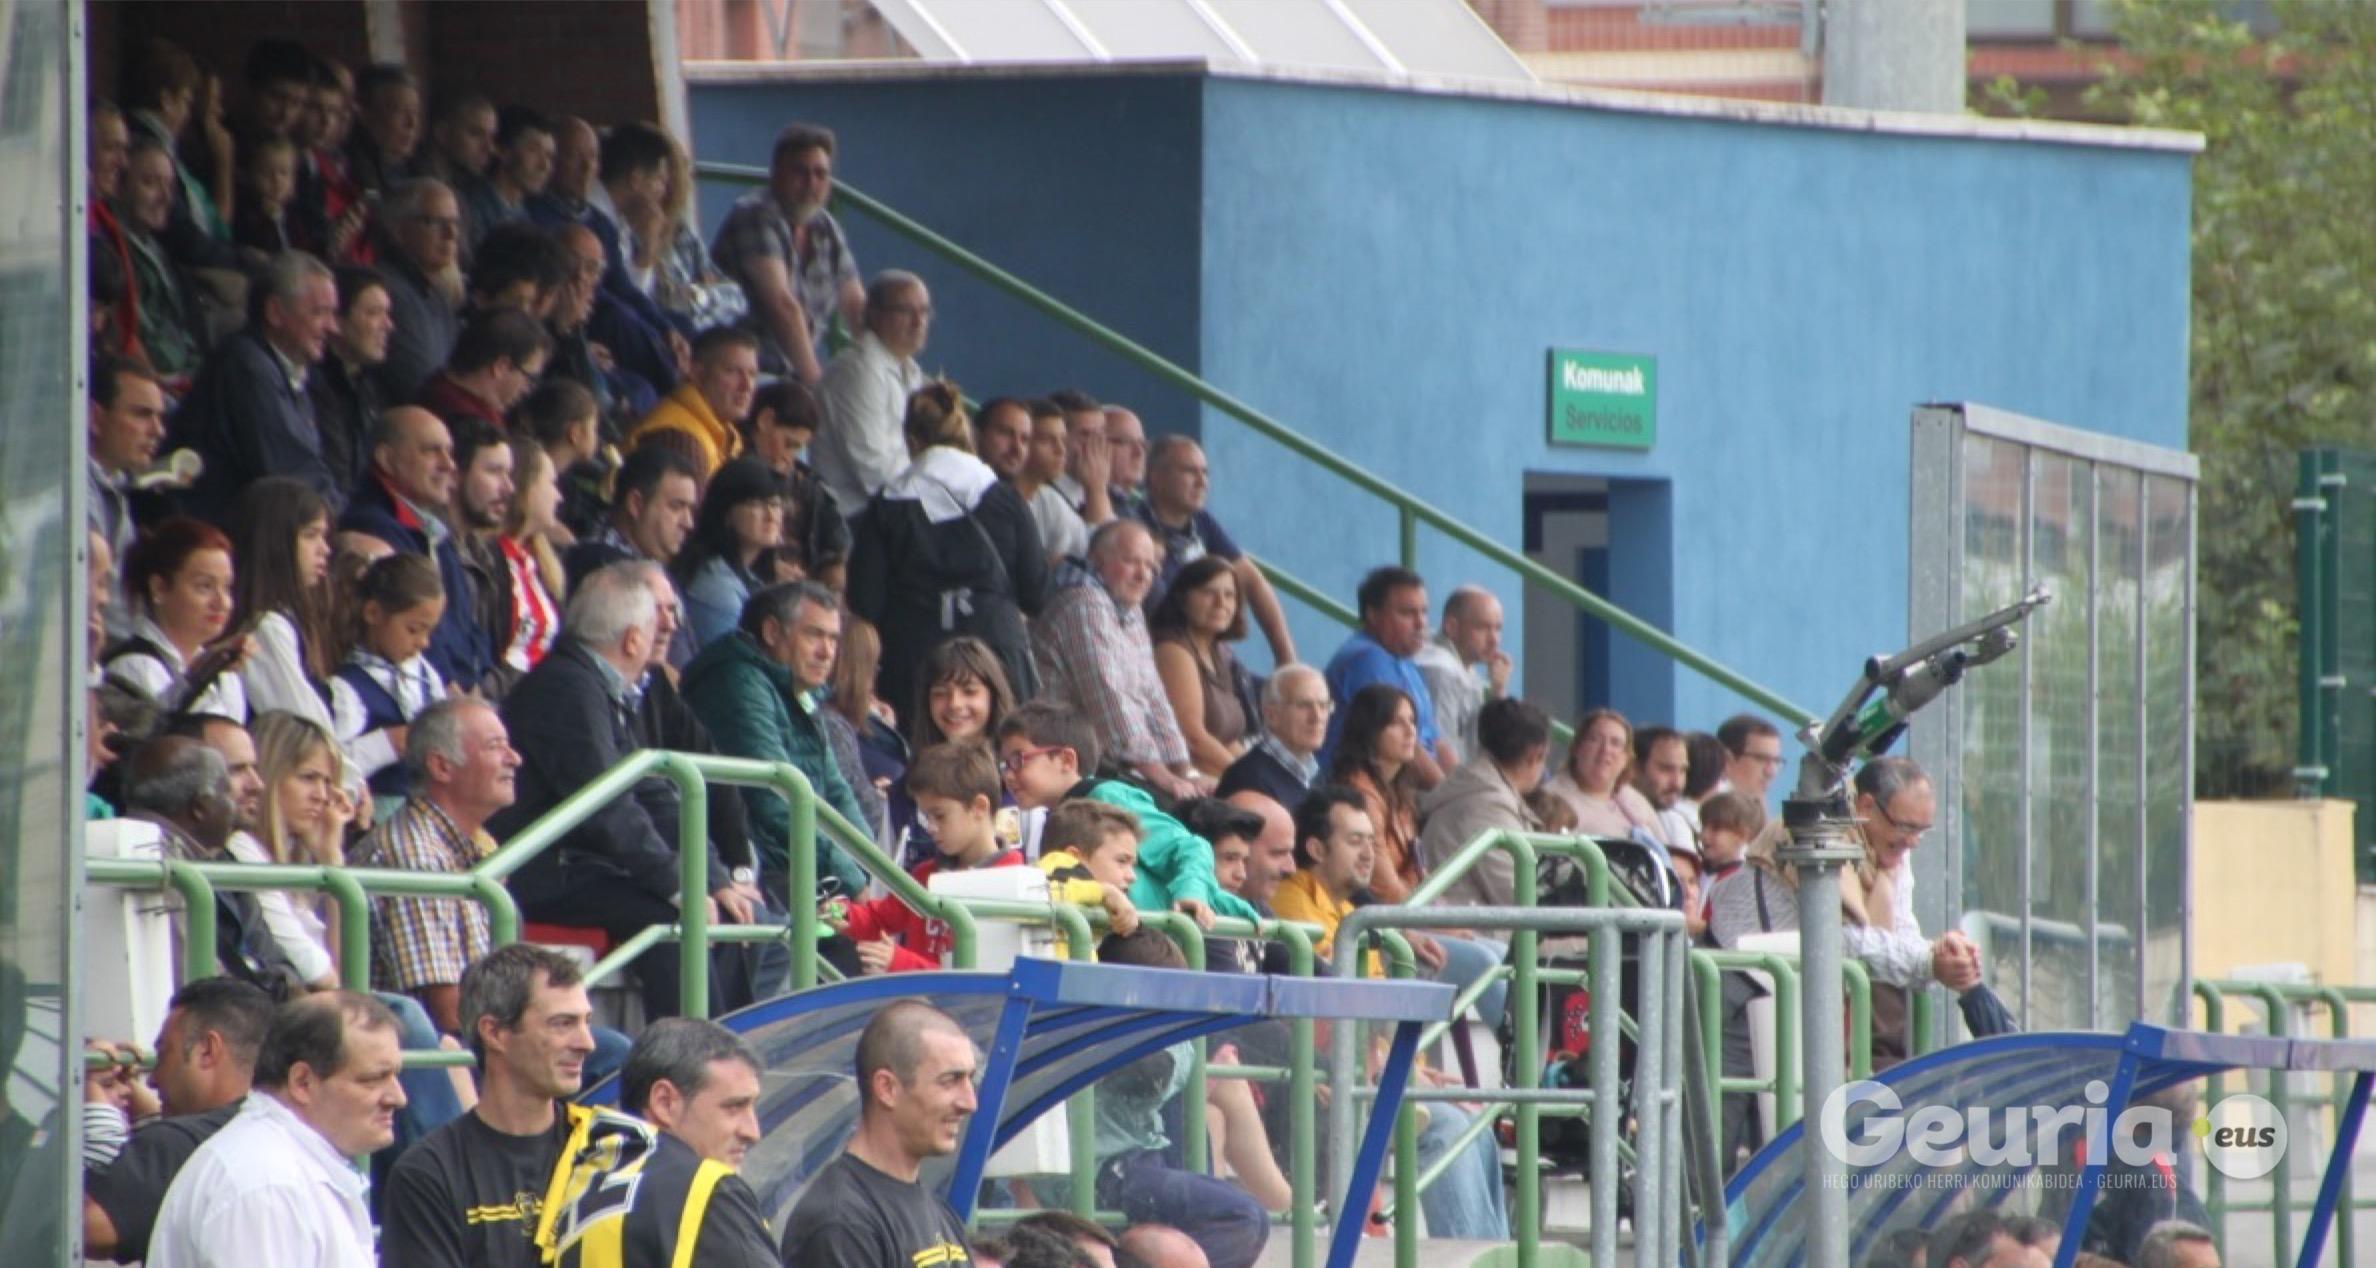 basauri_san_fausto_2015_futbol_basconia_beteranoak_4